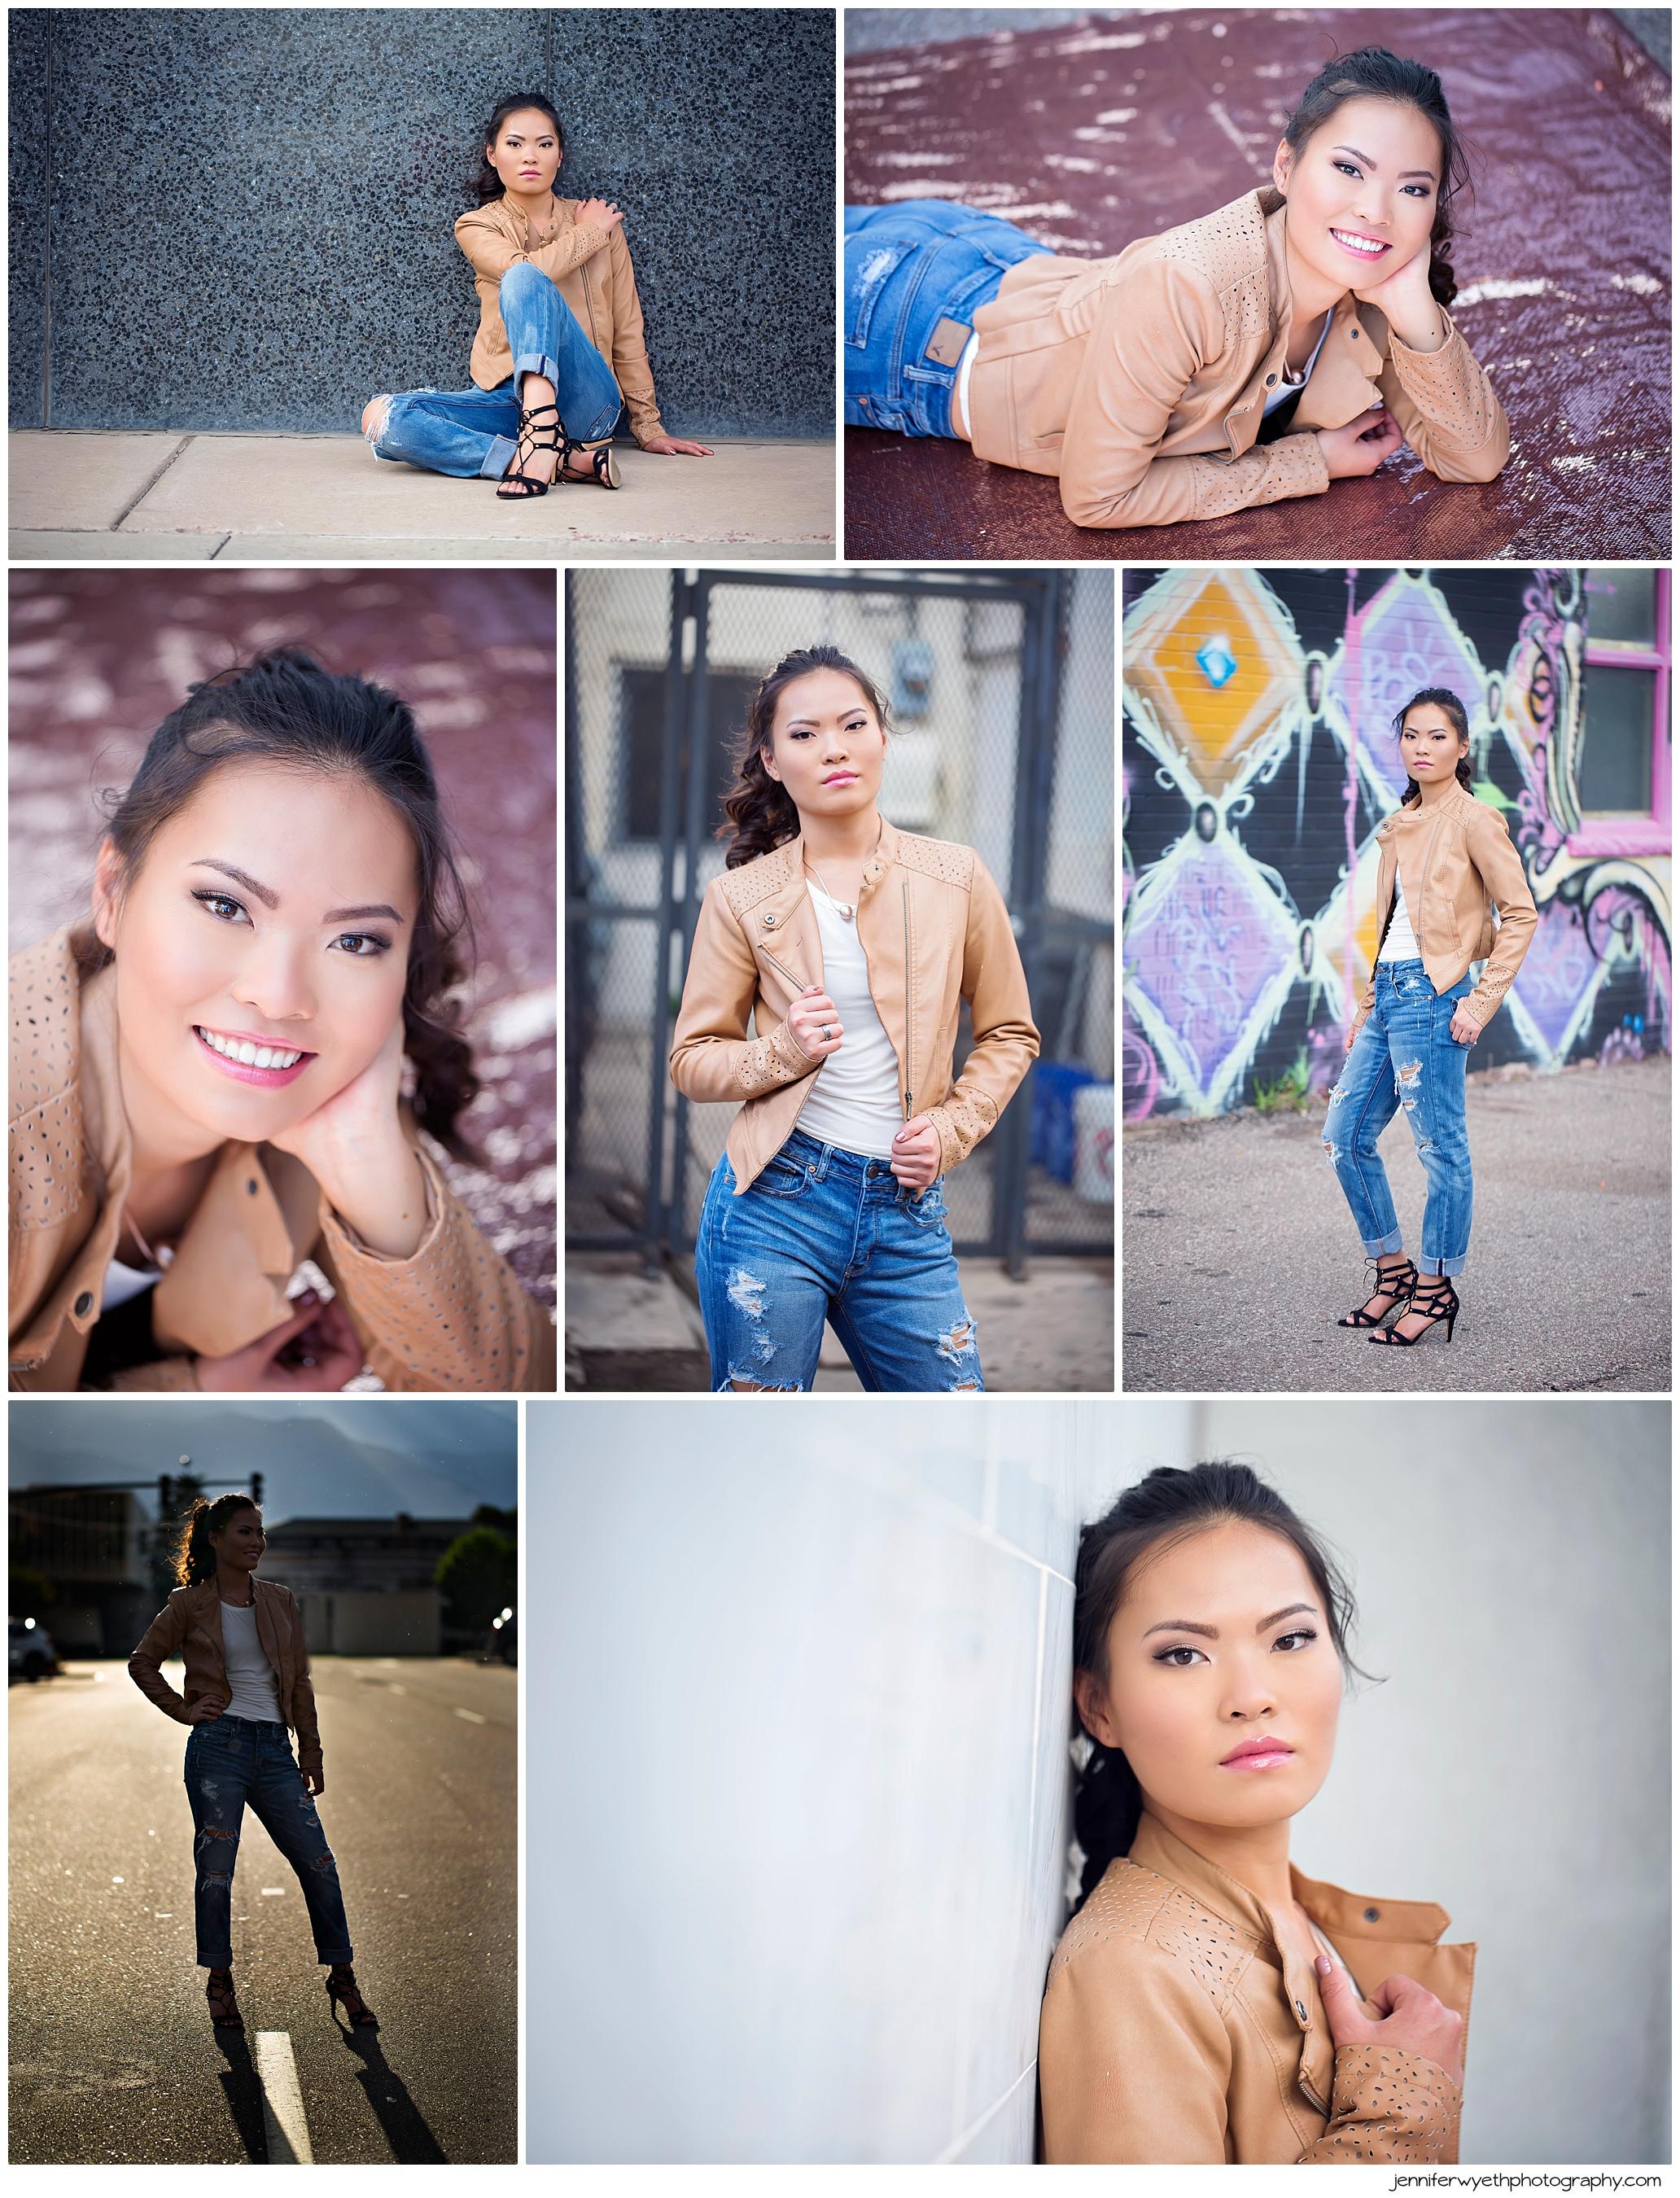 Jennifer-Wyeth-photography-senior-pictures-colorado-springs-photographer_0200.jpg